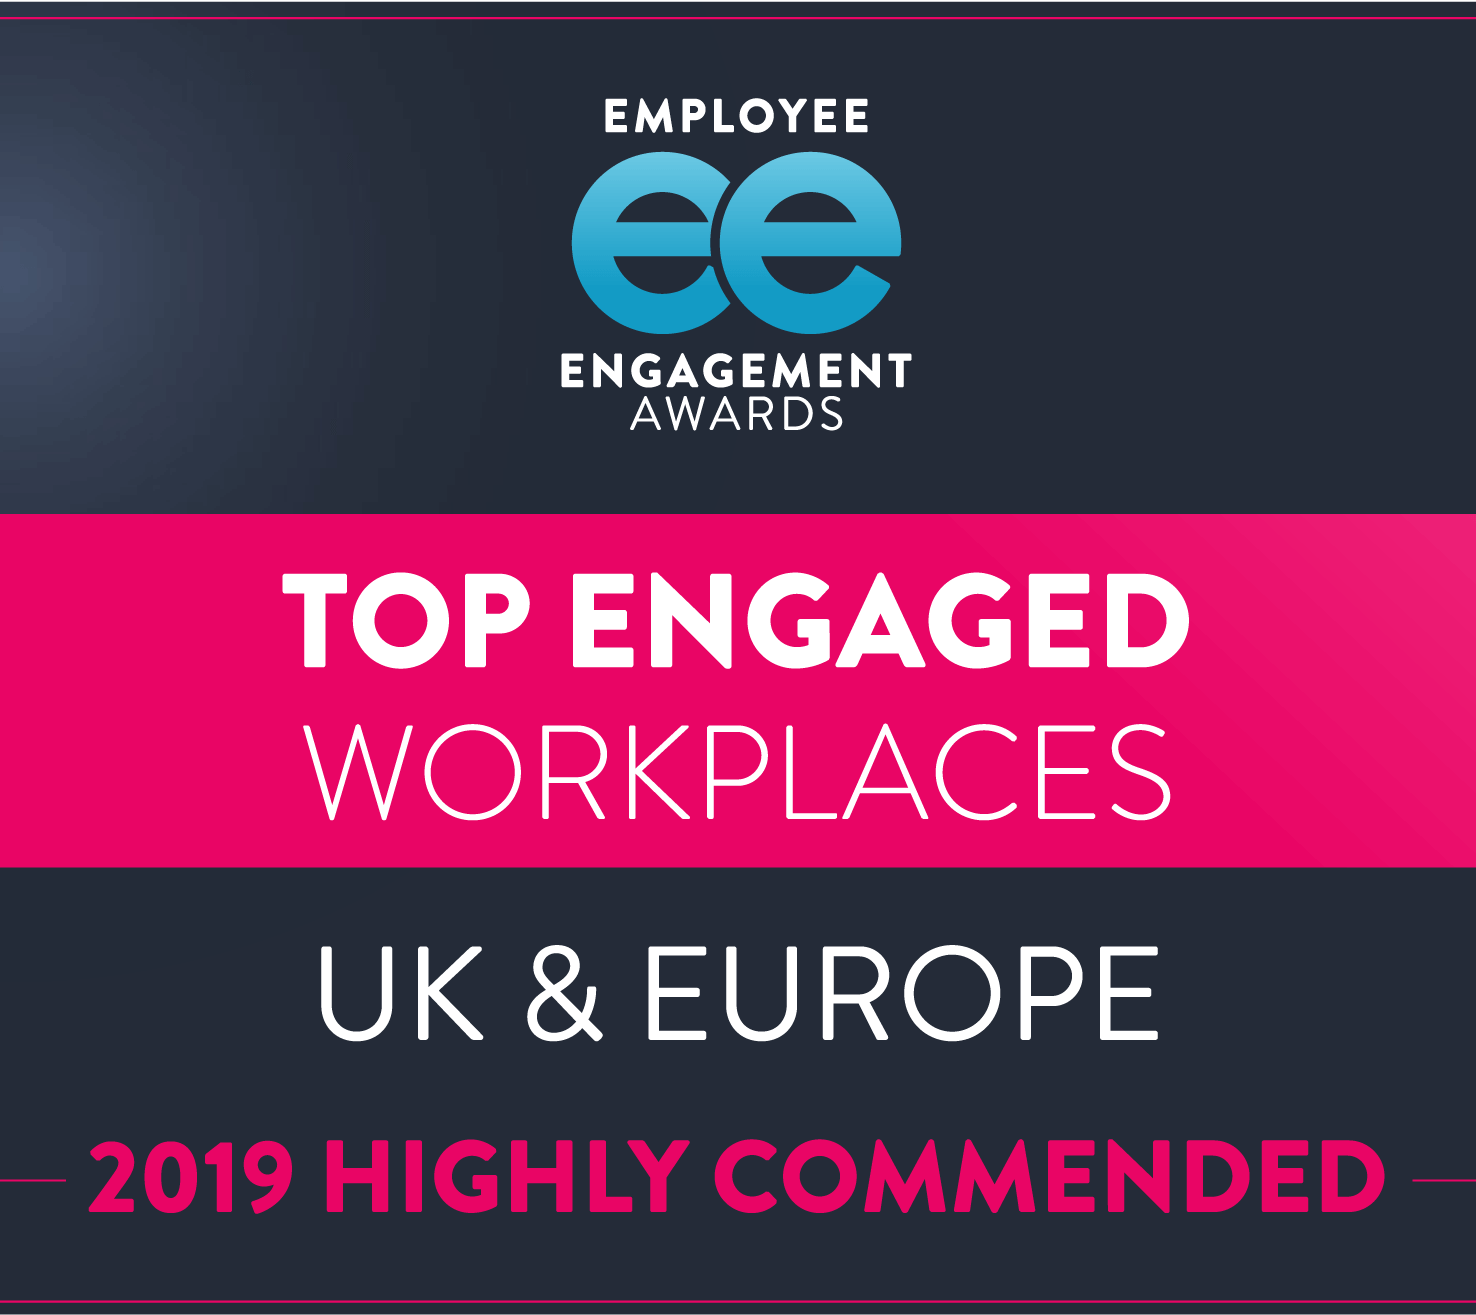 Employee Engagement Awards 2019 - Top Engaged